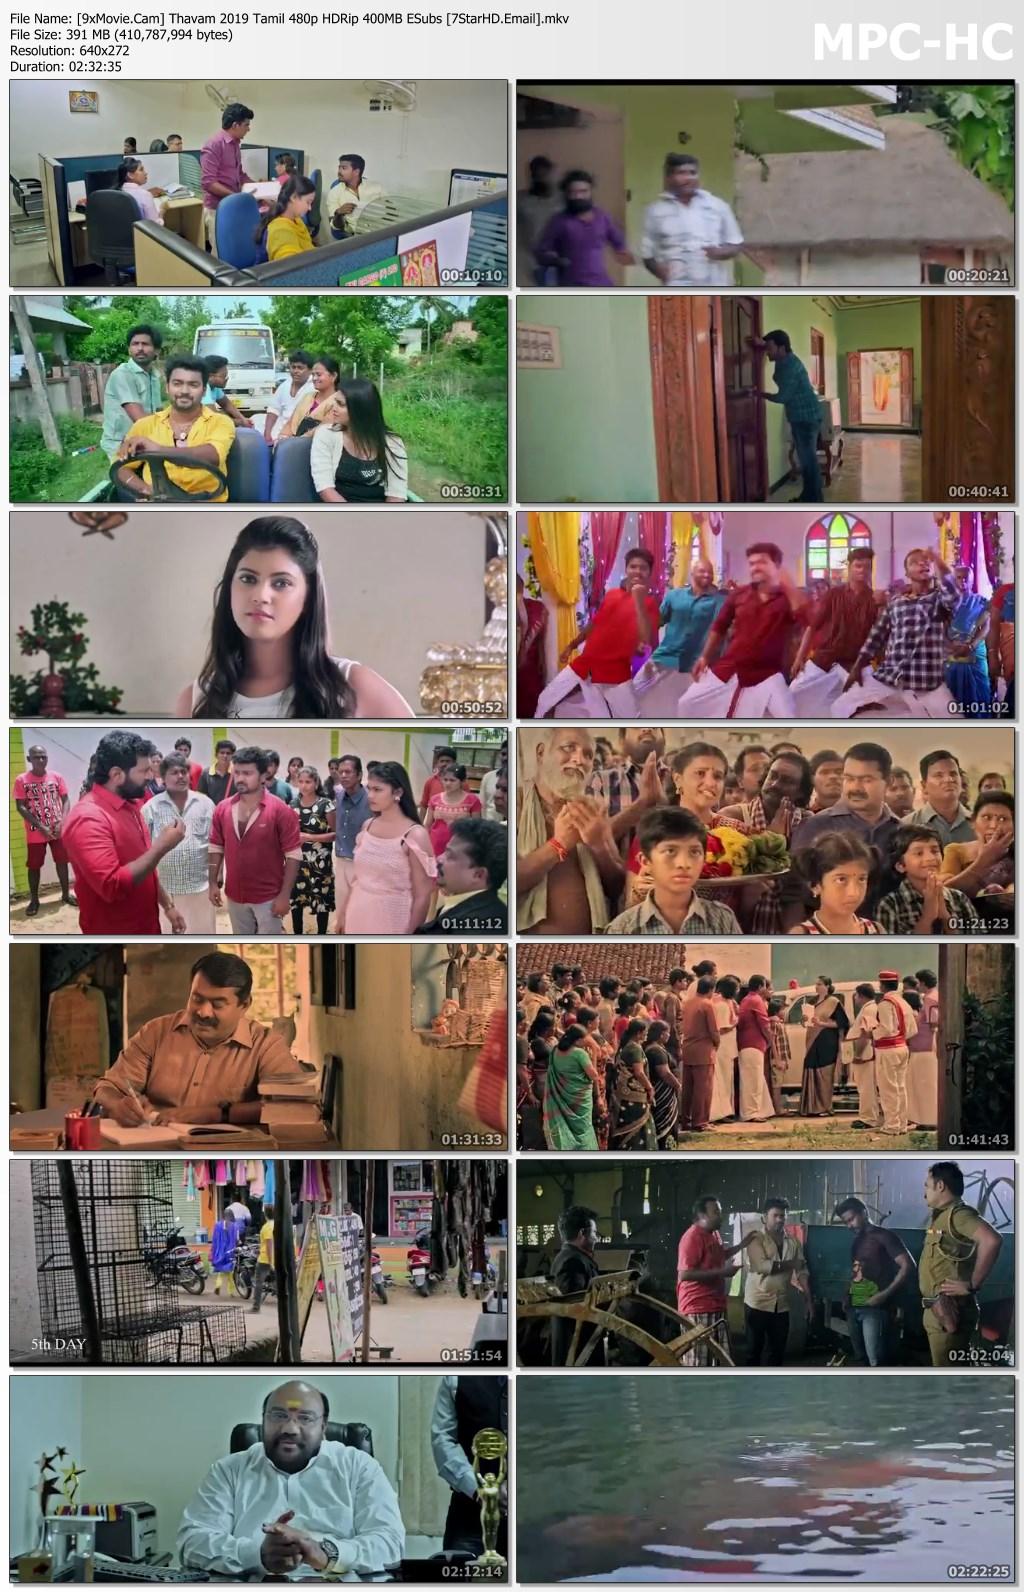 Thavam 2019 Tamil 480p HDRip x264 400MB ESubs